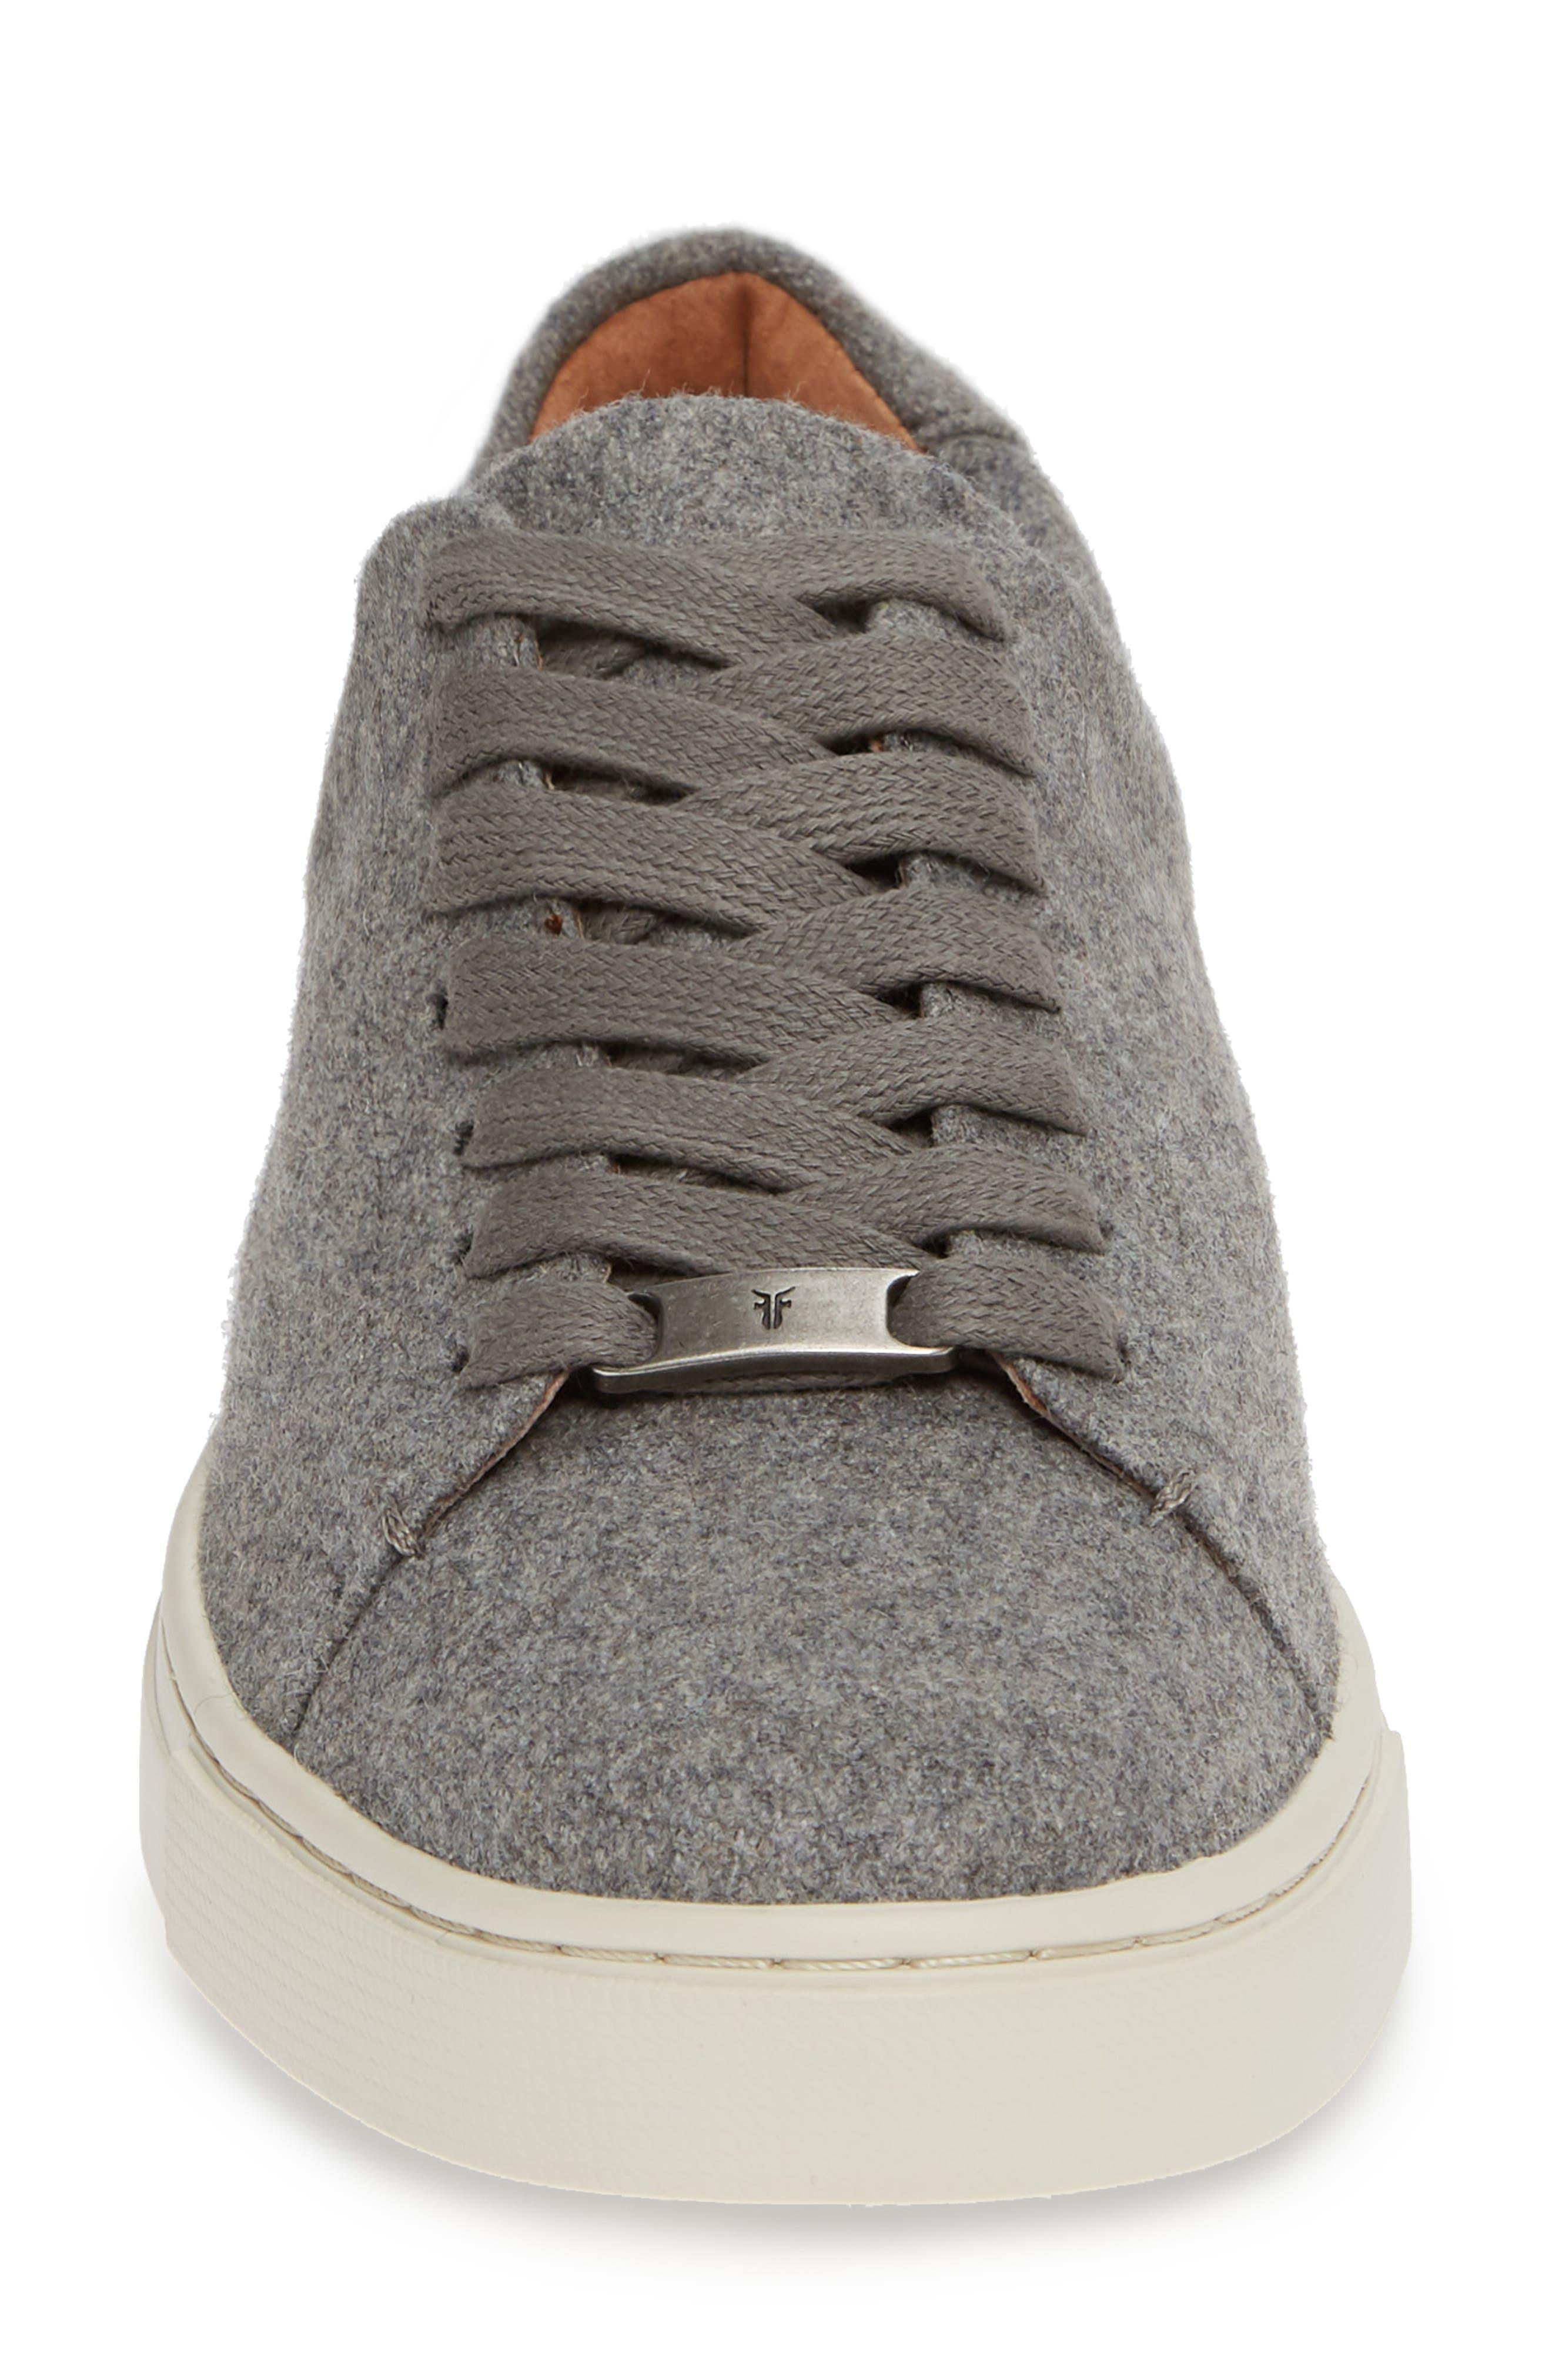 Ivy Sneaker,                             Alternate thumbnail 4, color,                             GREY WOOL FABRIC